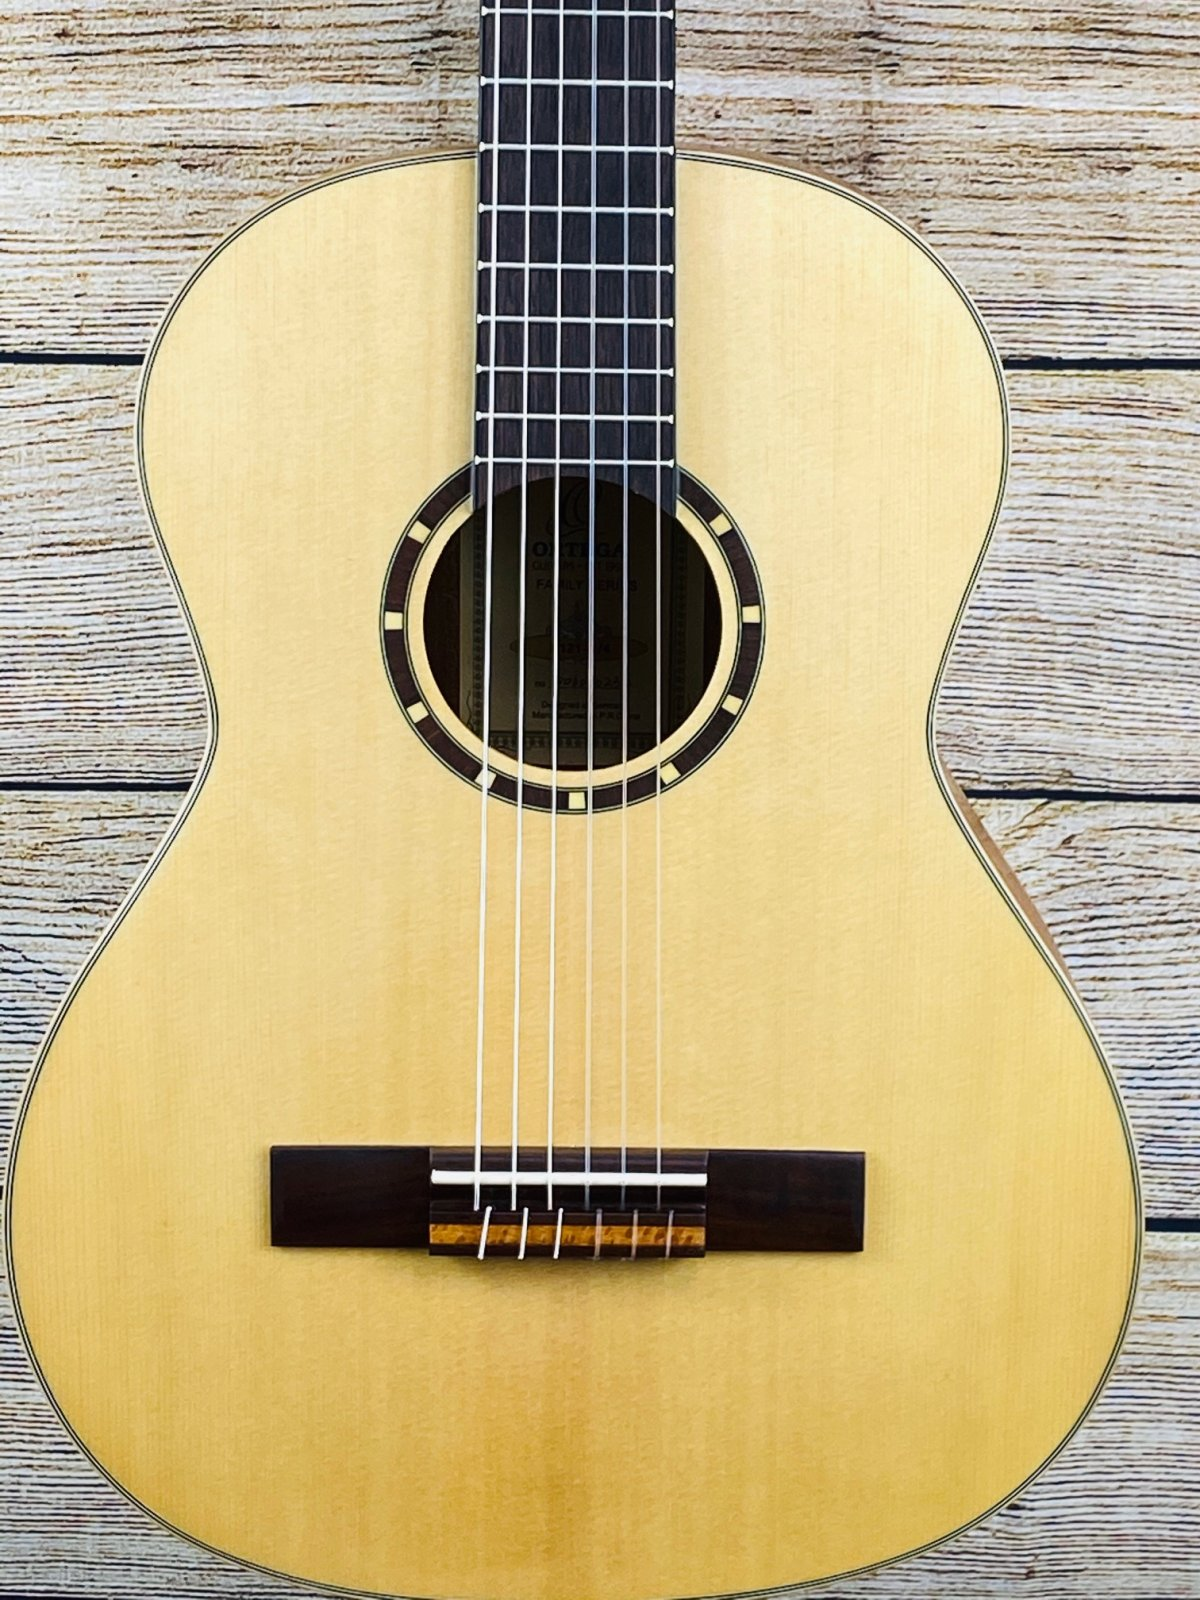 Ortega Guitars R122 Family Series Cedar Top Nylon String 3/4 Size Acoustic Guitar, Walnut Fretboard, Natural